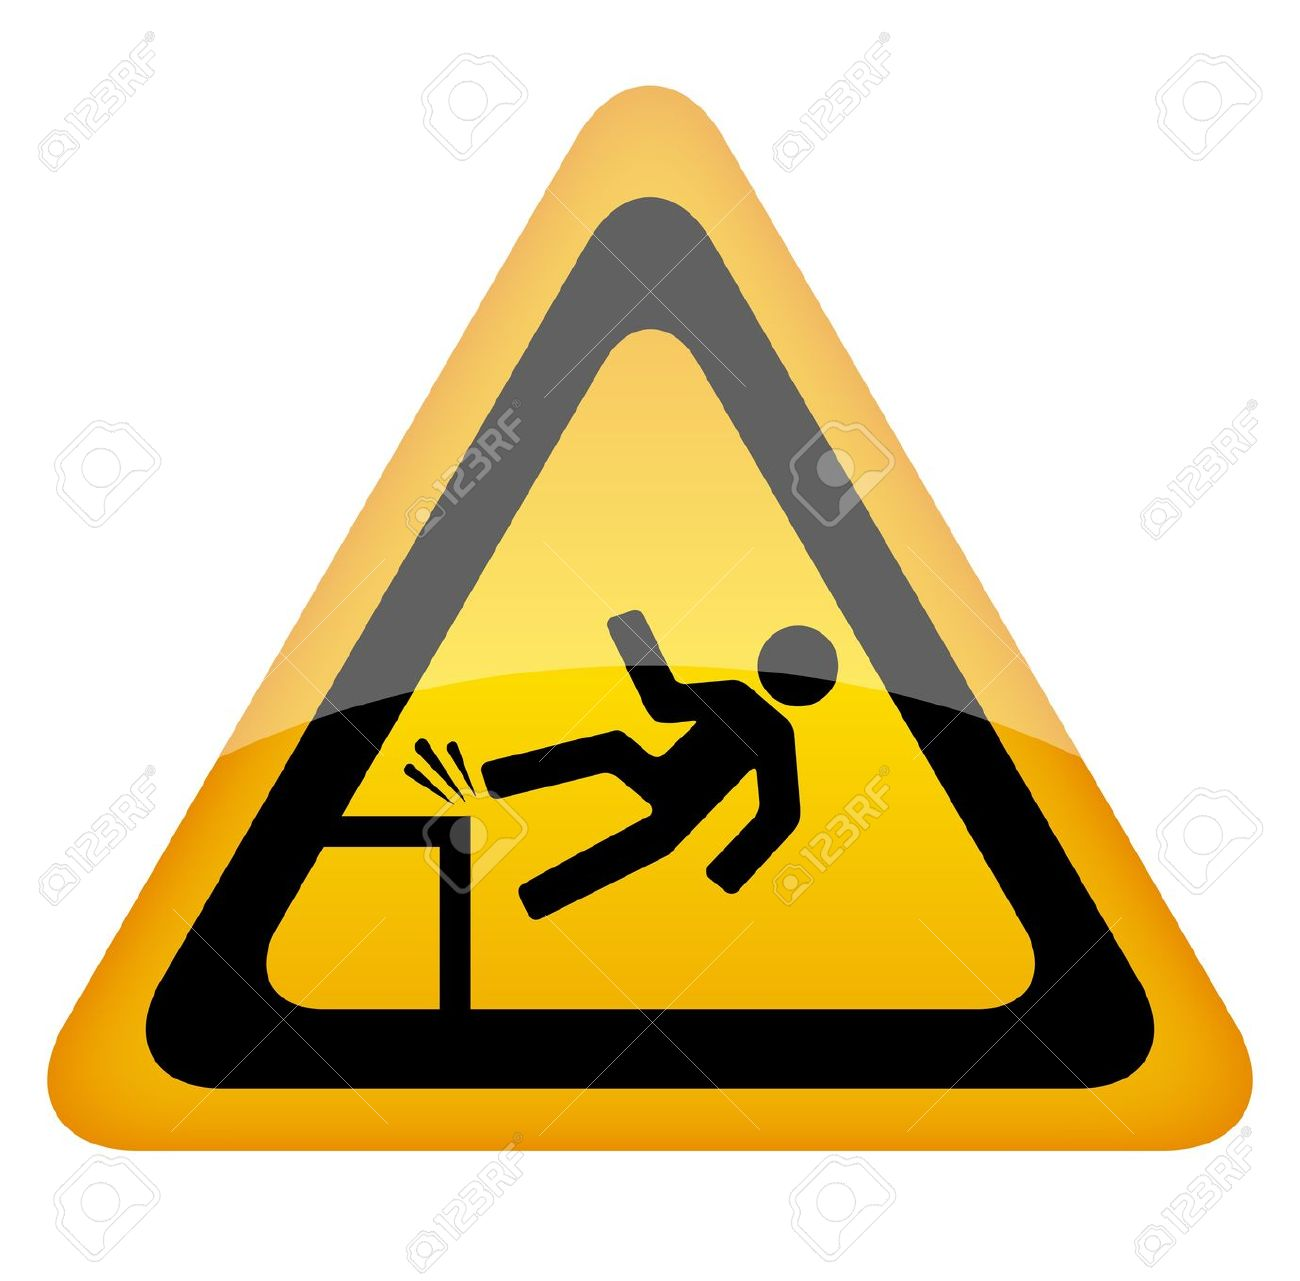 Fall Danger Warning Sign, Vector Illustration Royalty Free.